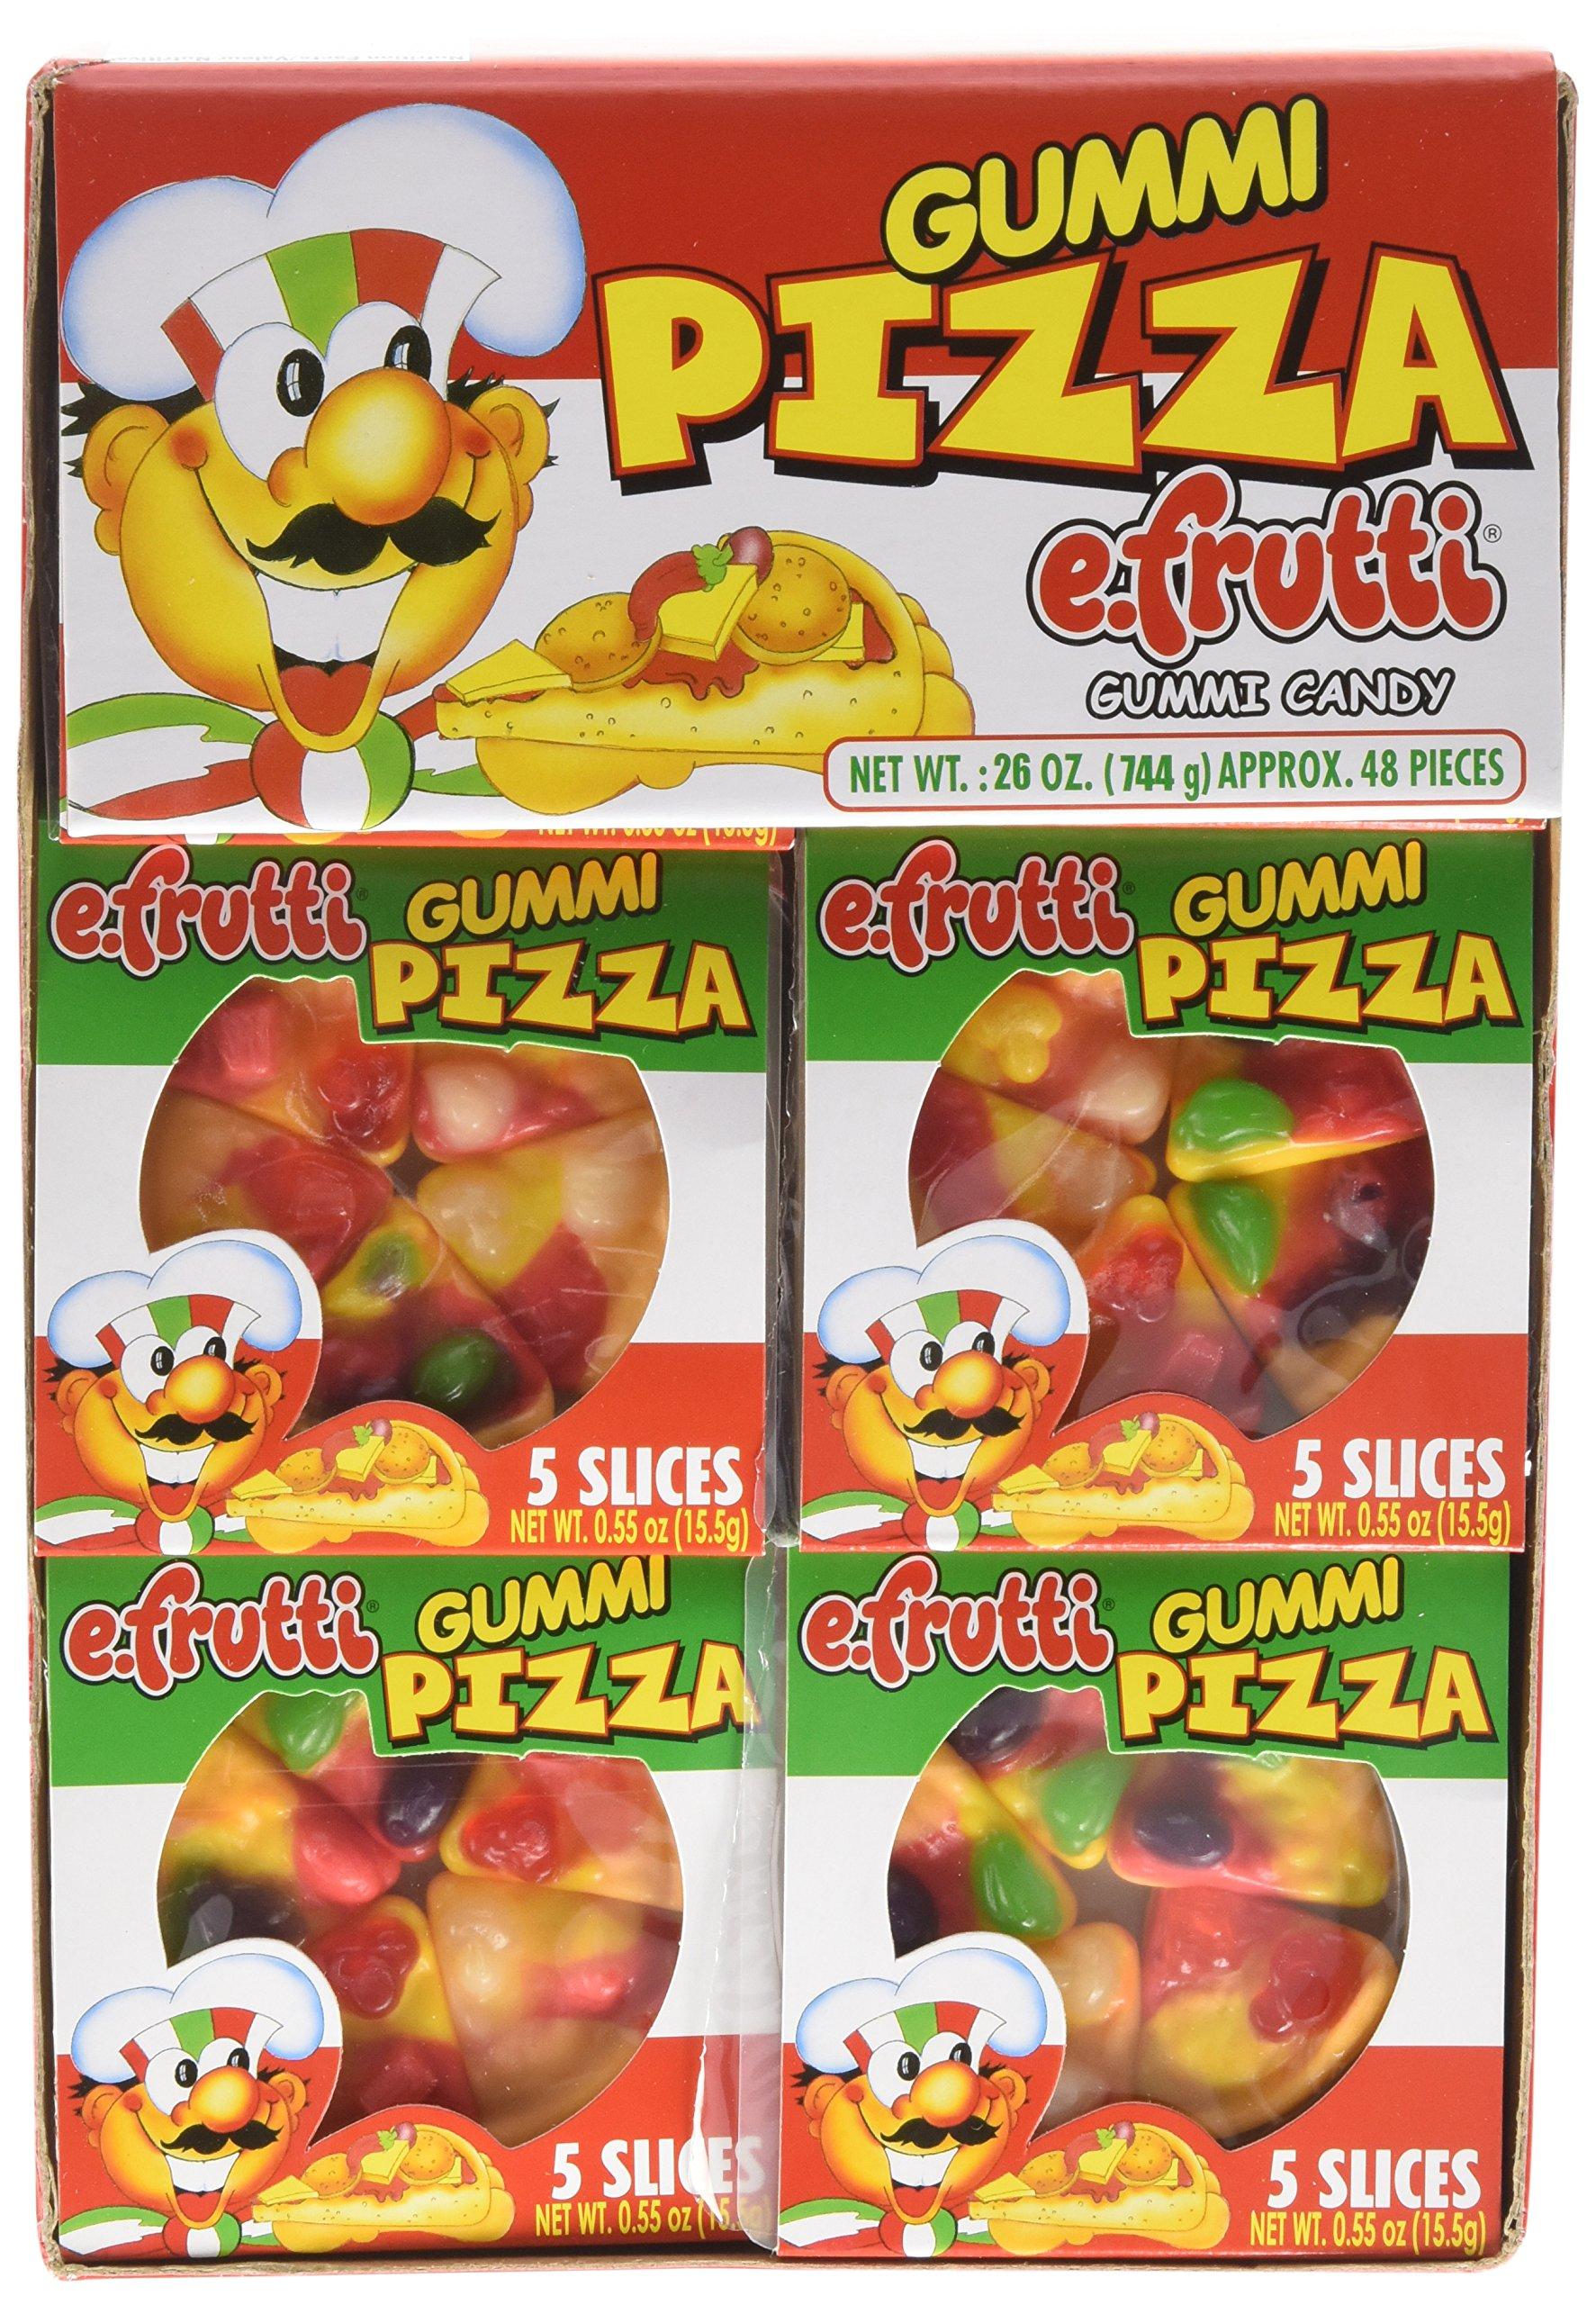 Gummi Pizza by E-Fruitti 48 Count  (Net Wt. 26oz)